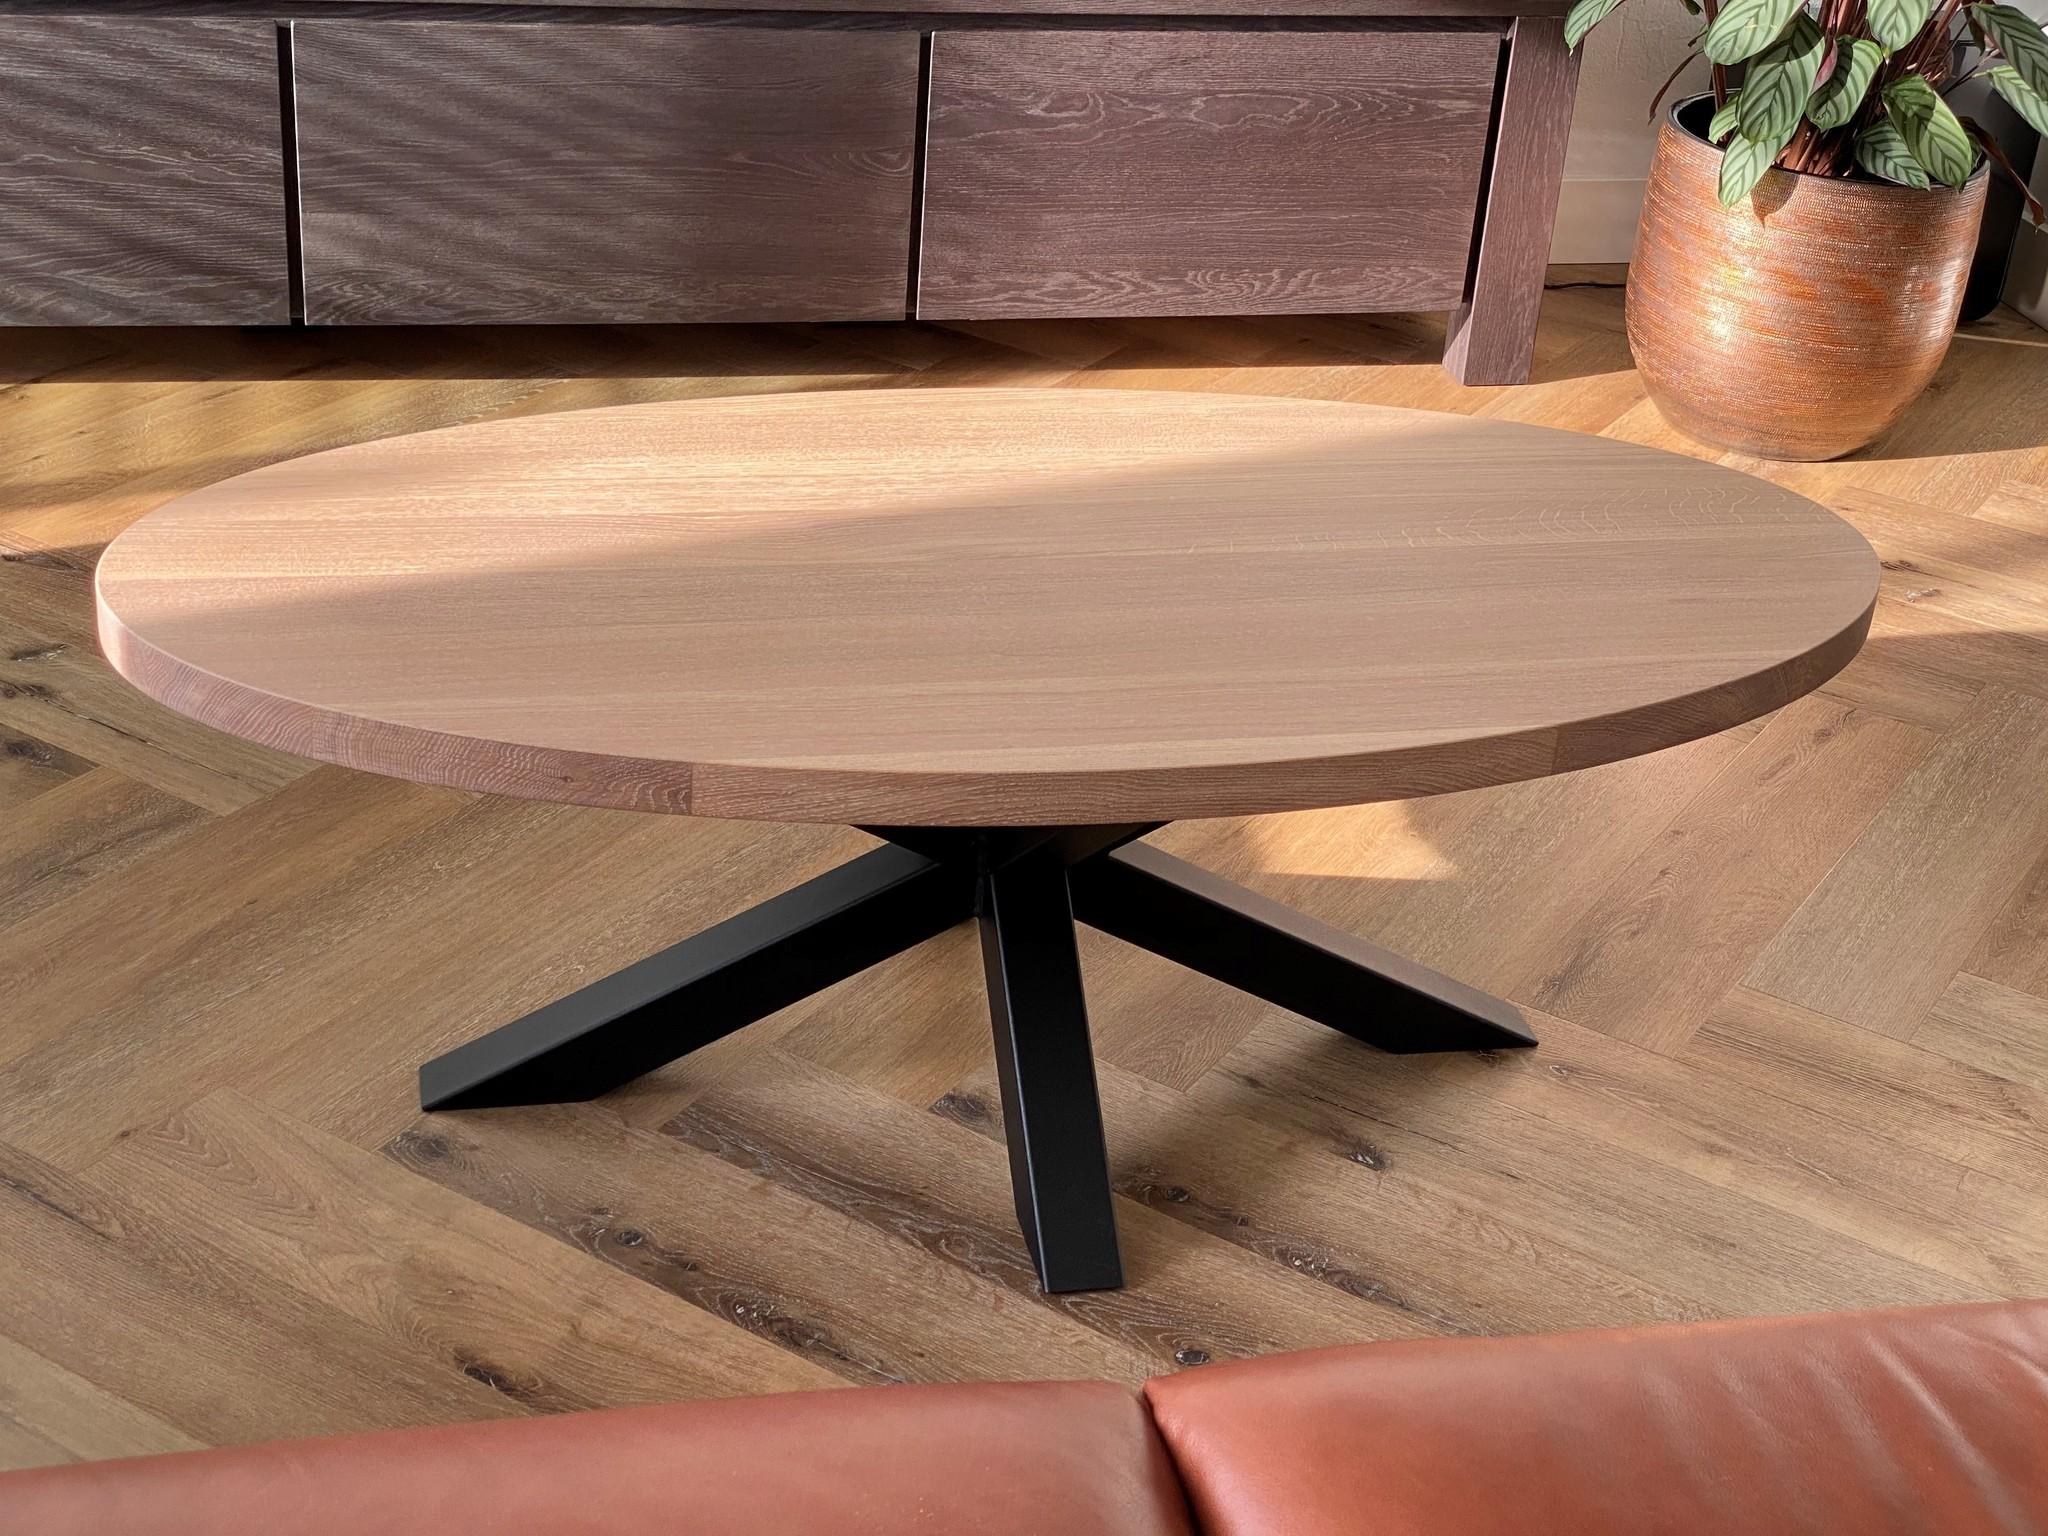 Steiken-ovale-salontafel-3Dkruispoot